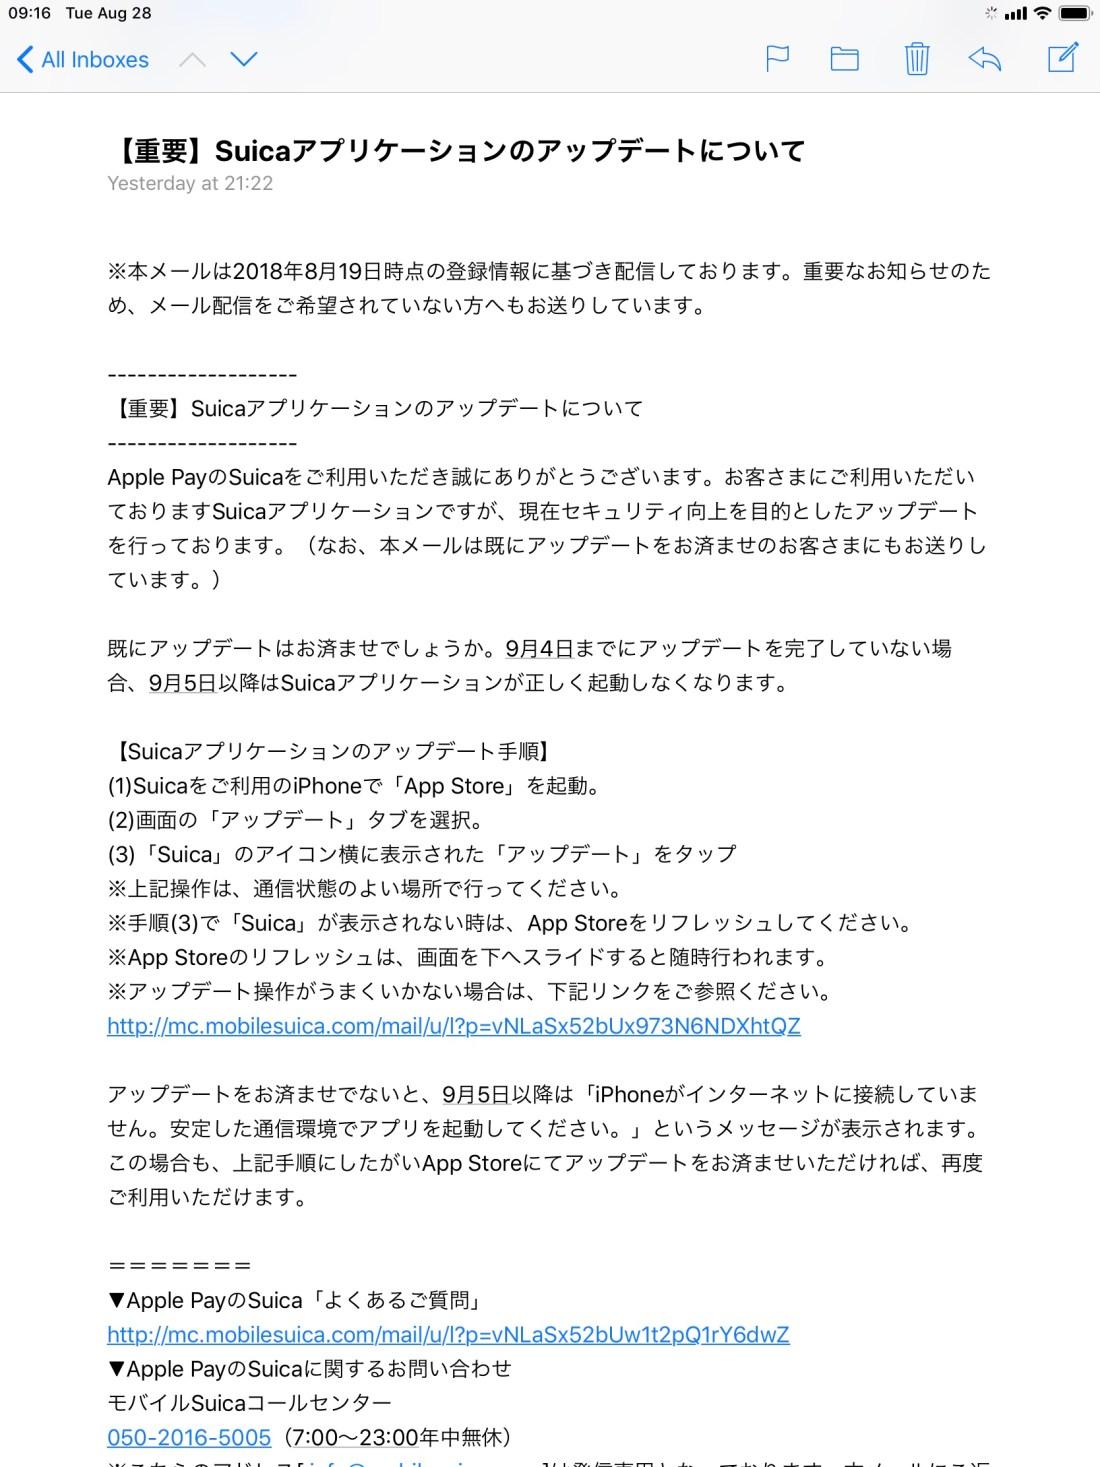 JR East Suica App Security Update Notice